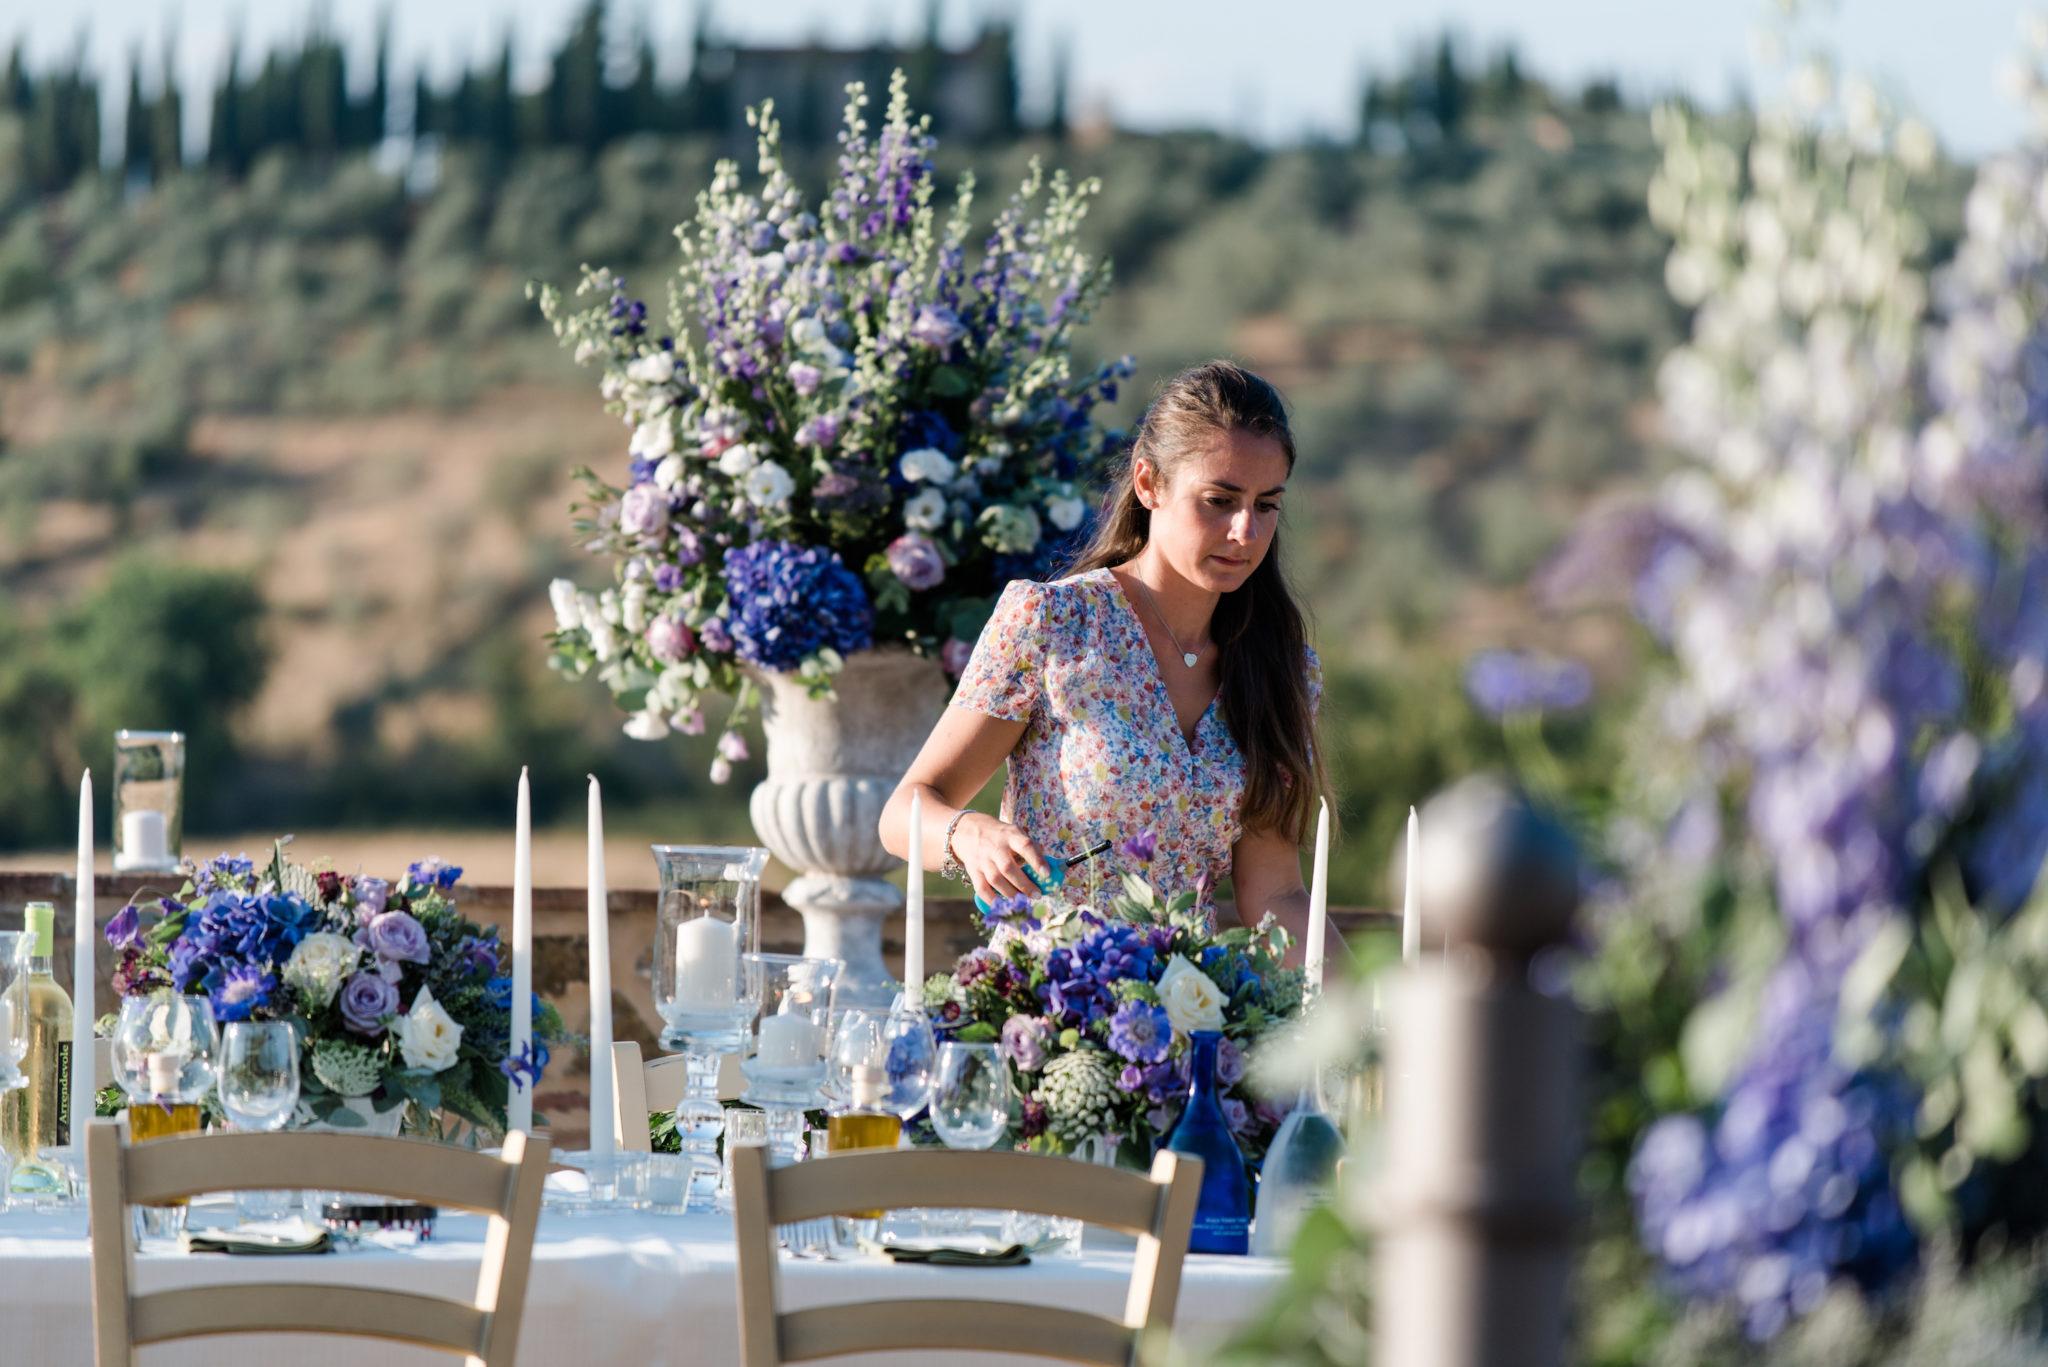 Hochzeitsplaner vs Bankettmanager